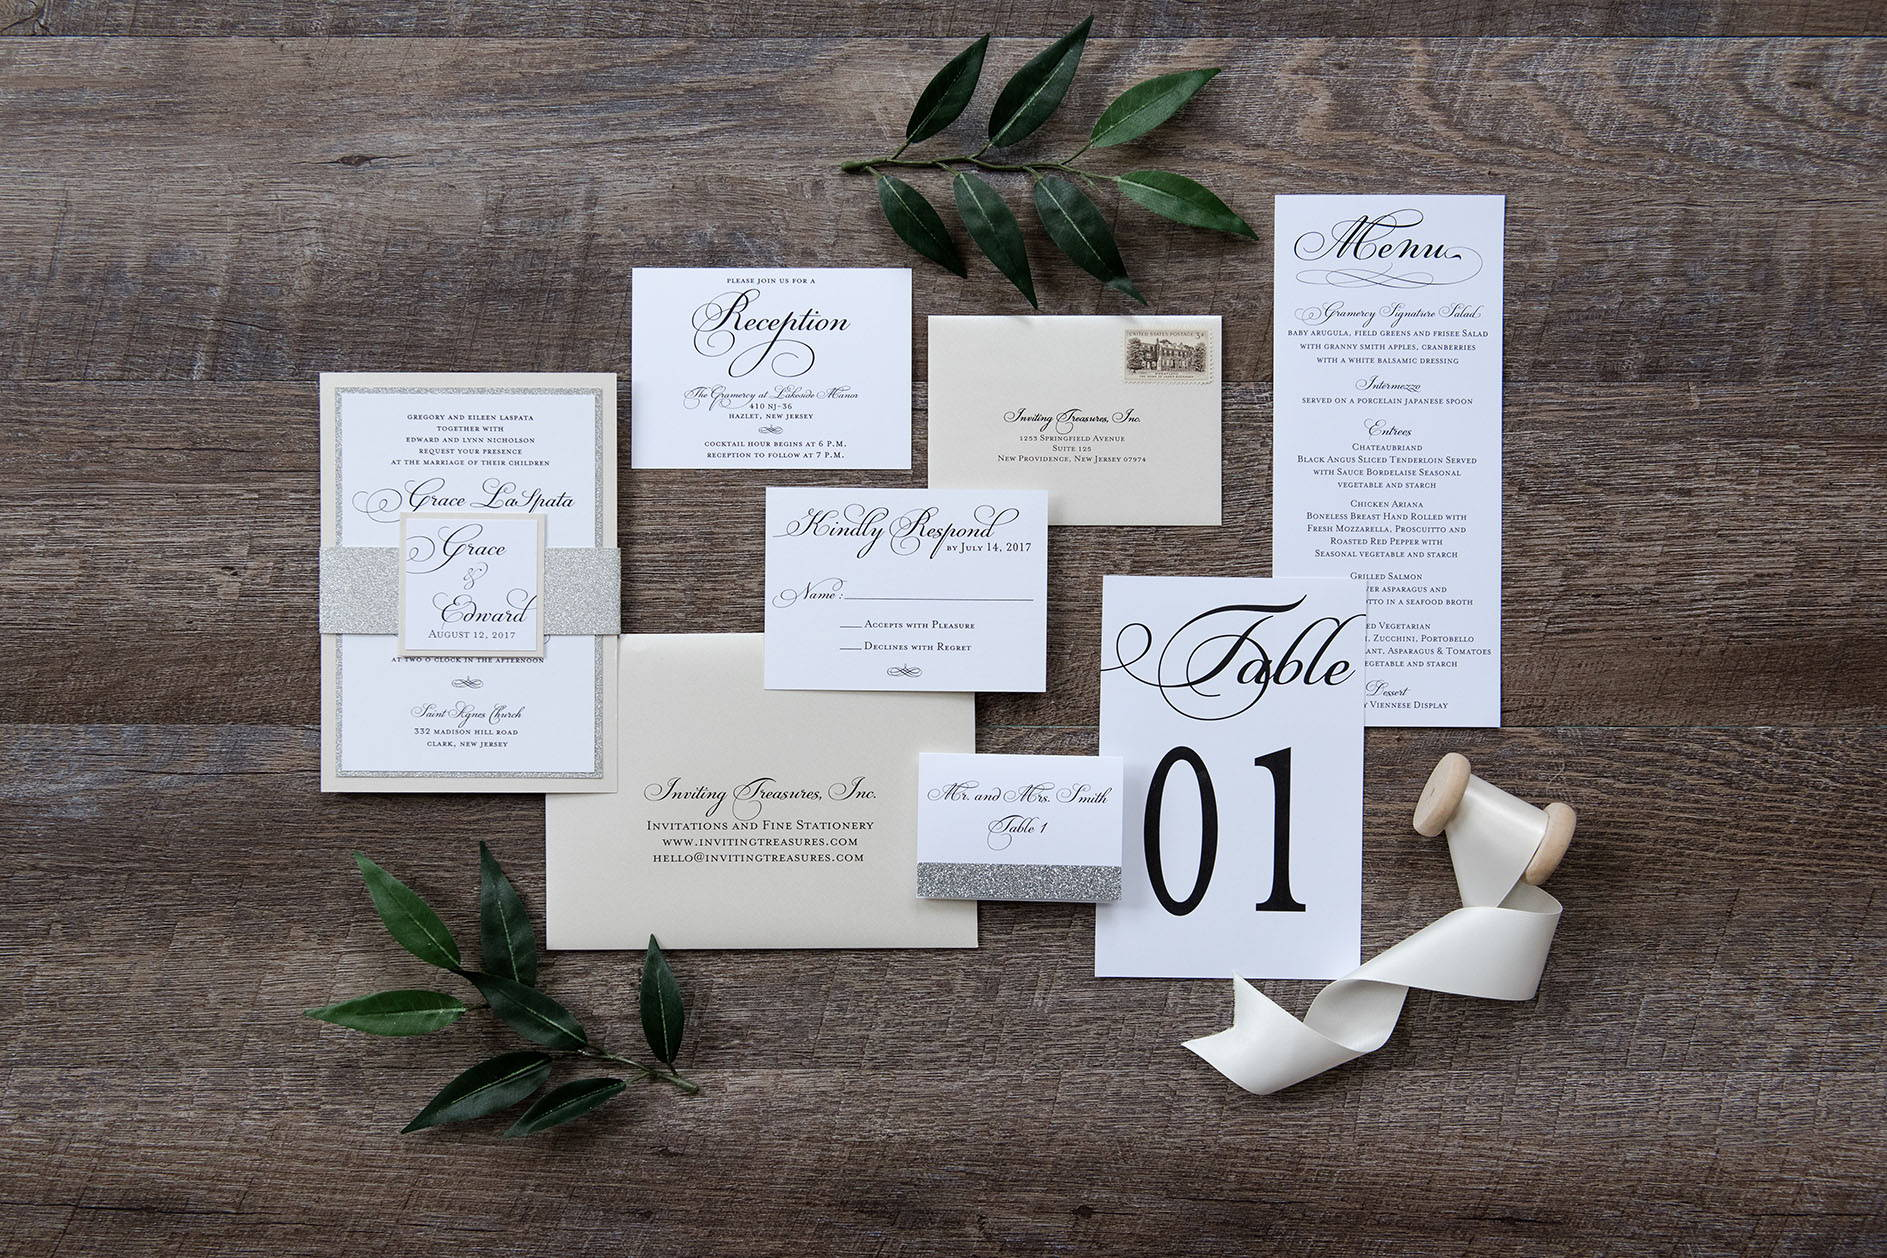 custom wedding invitation, custom invitation, wedding invitation, event invitation